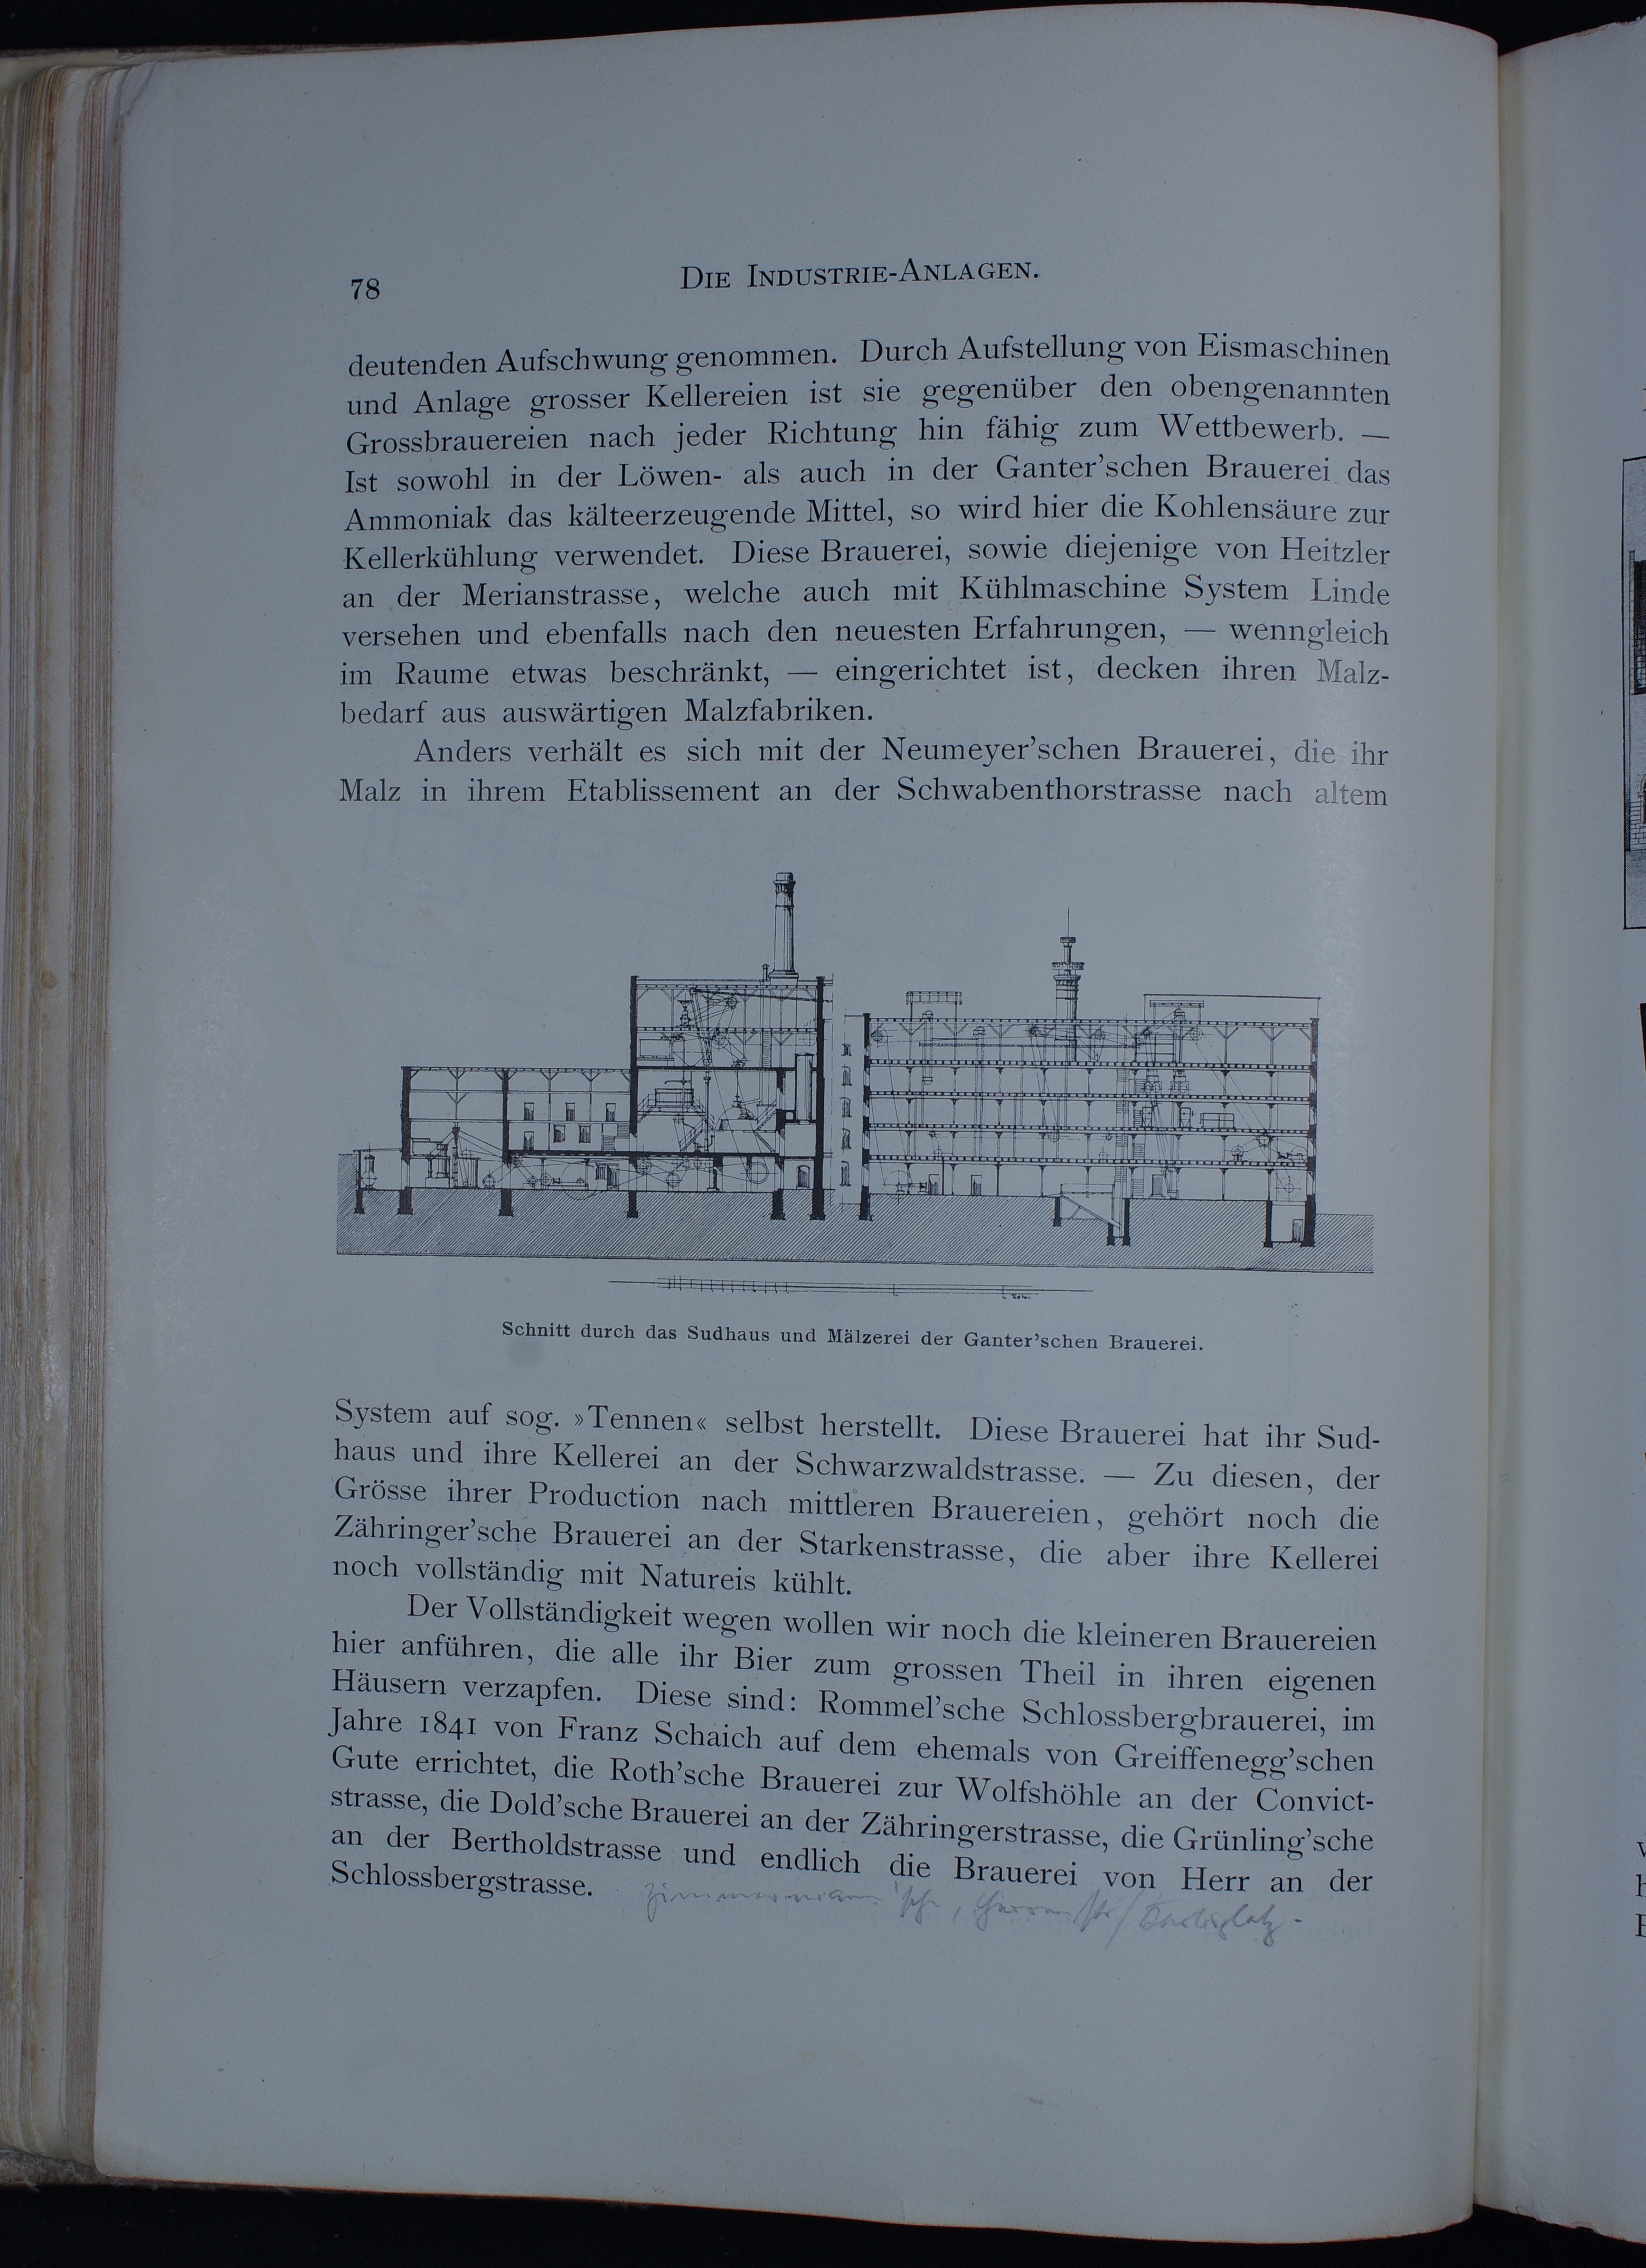 File:Freiburg Bauten 078.jpg - Wikimedia Commons